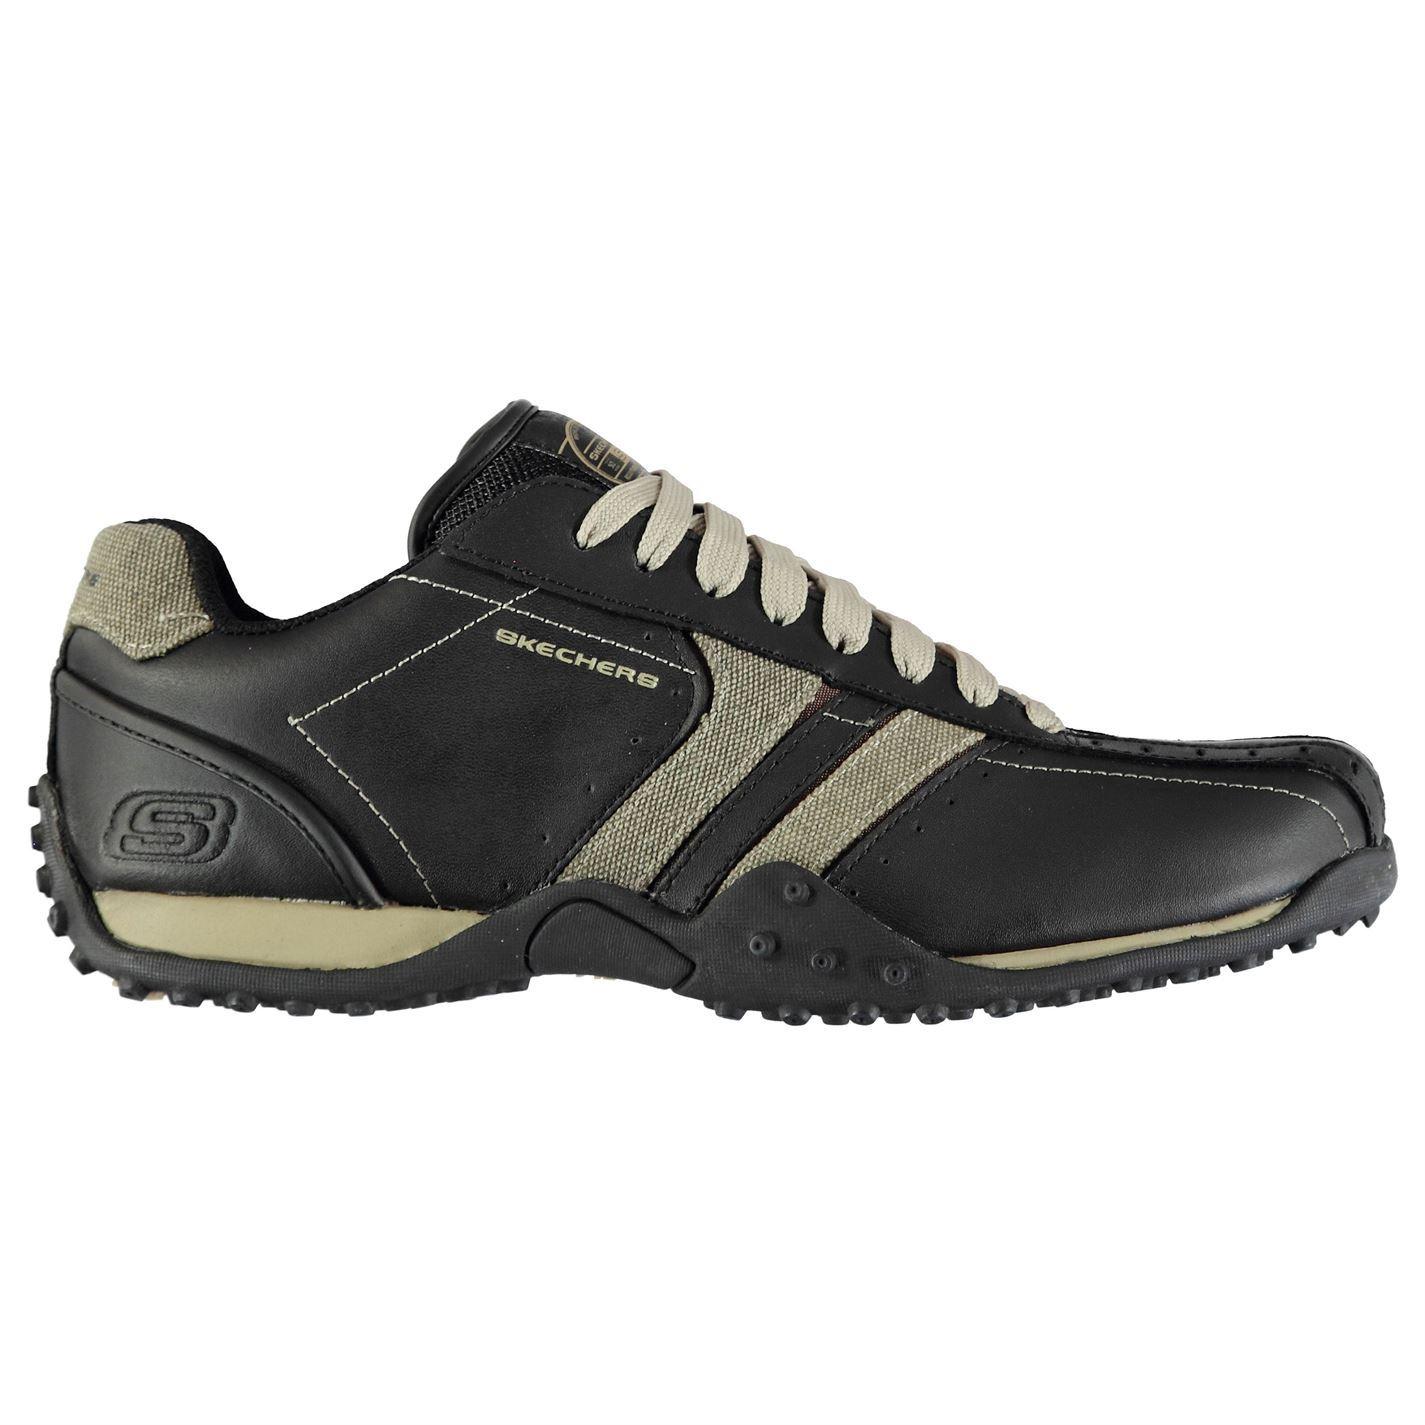 Skechers-Urban-Track-Forward-Trainers-Mens-Athleisure-Footwear-Shoes-Sneakers thumbnail 6